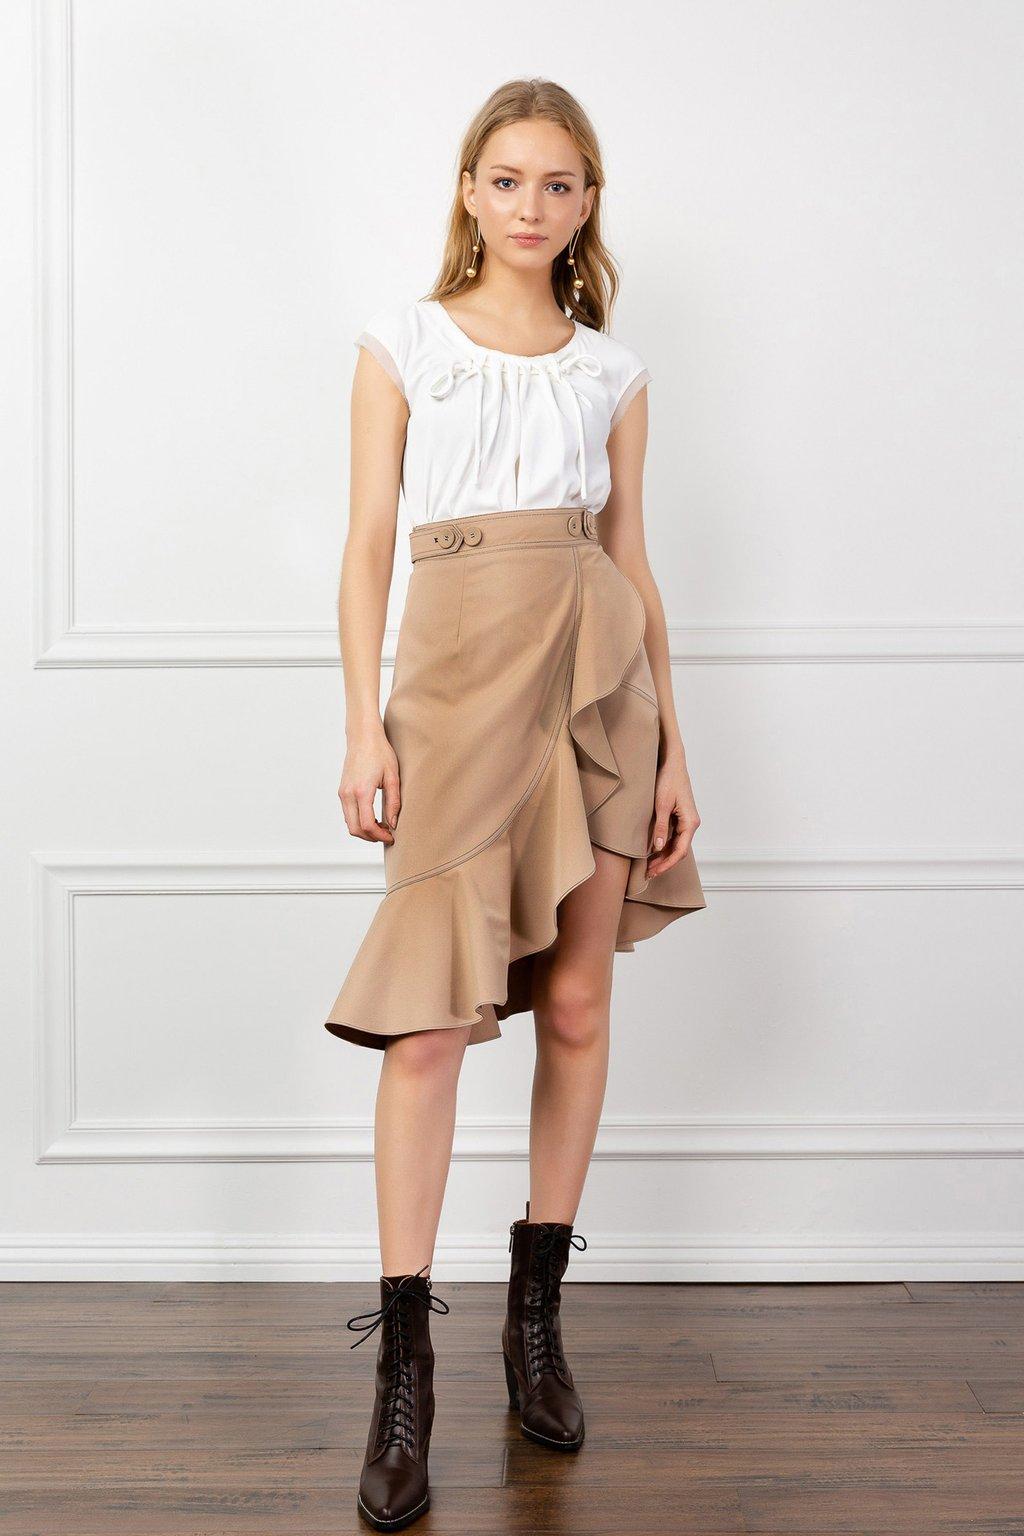 Montana Midi Skirt by J.ING women's fashion clothing